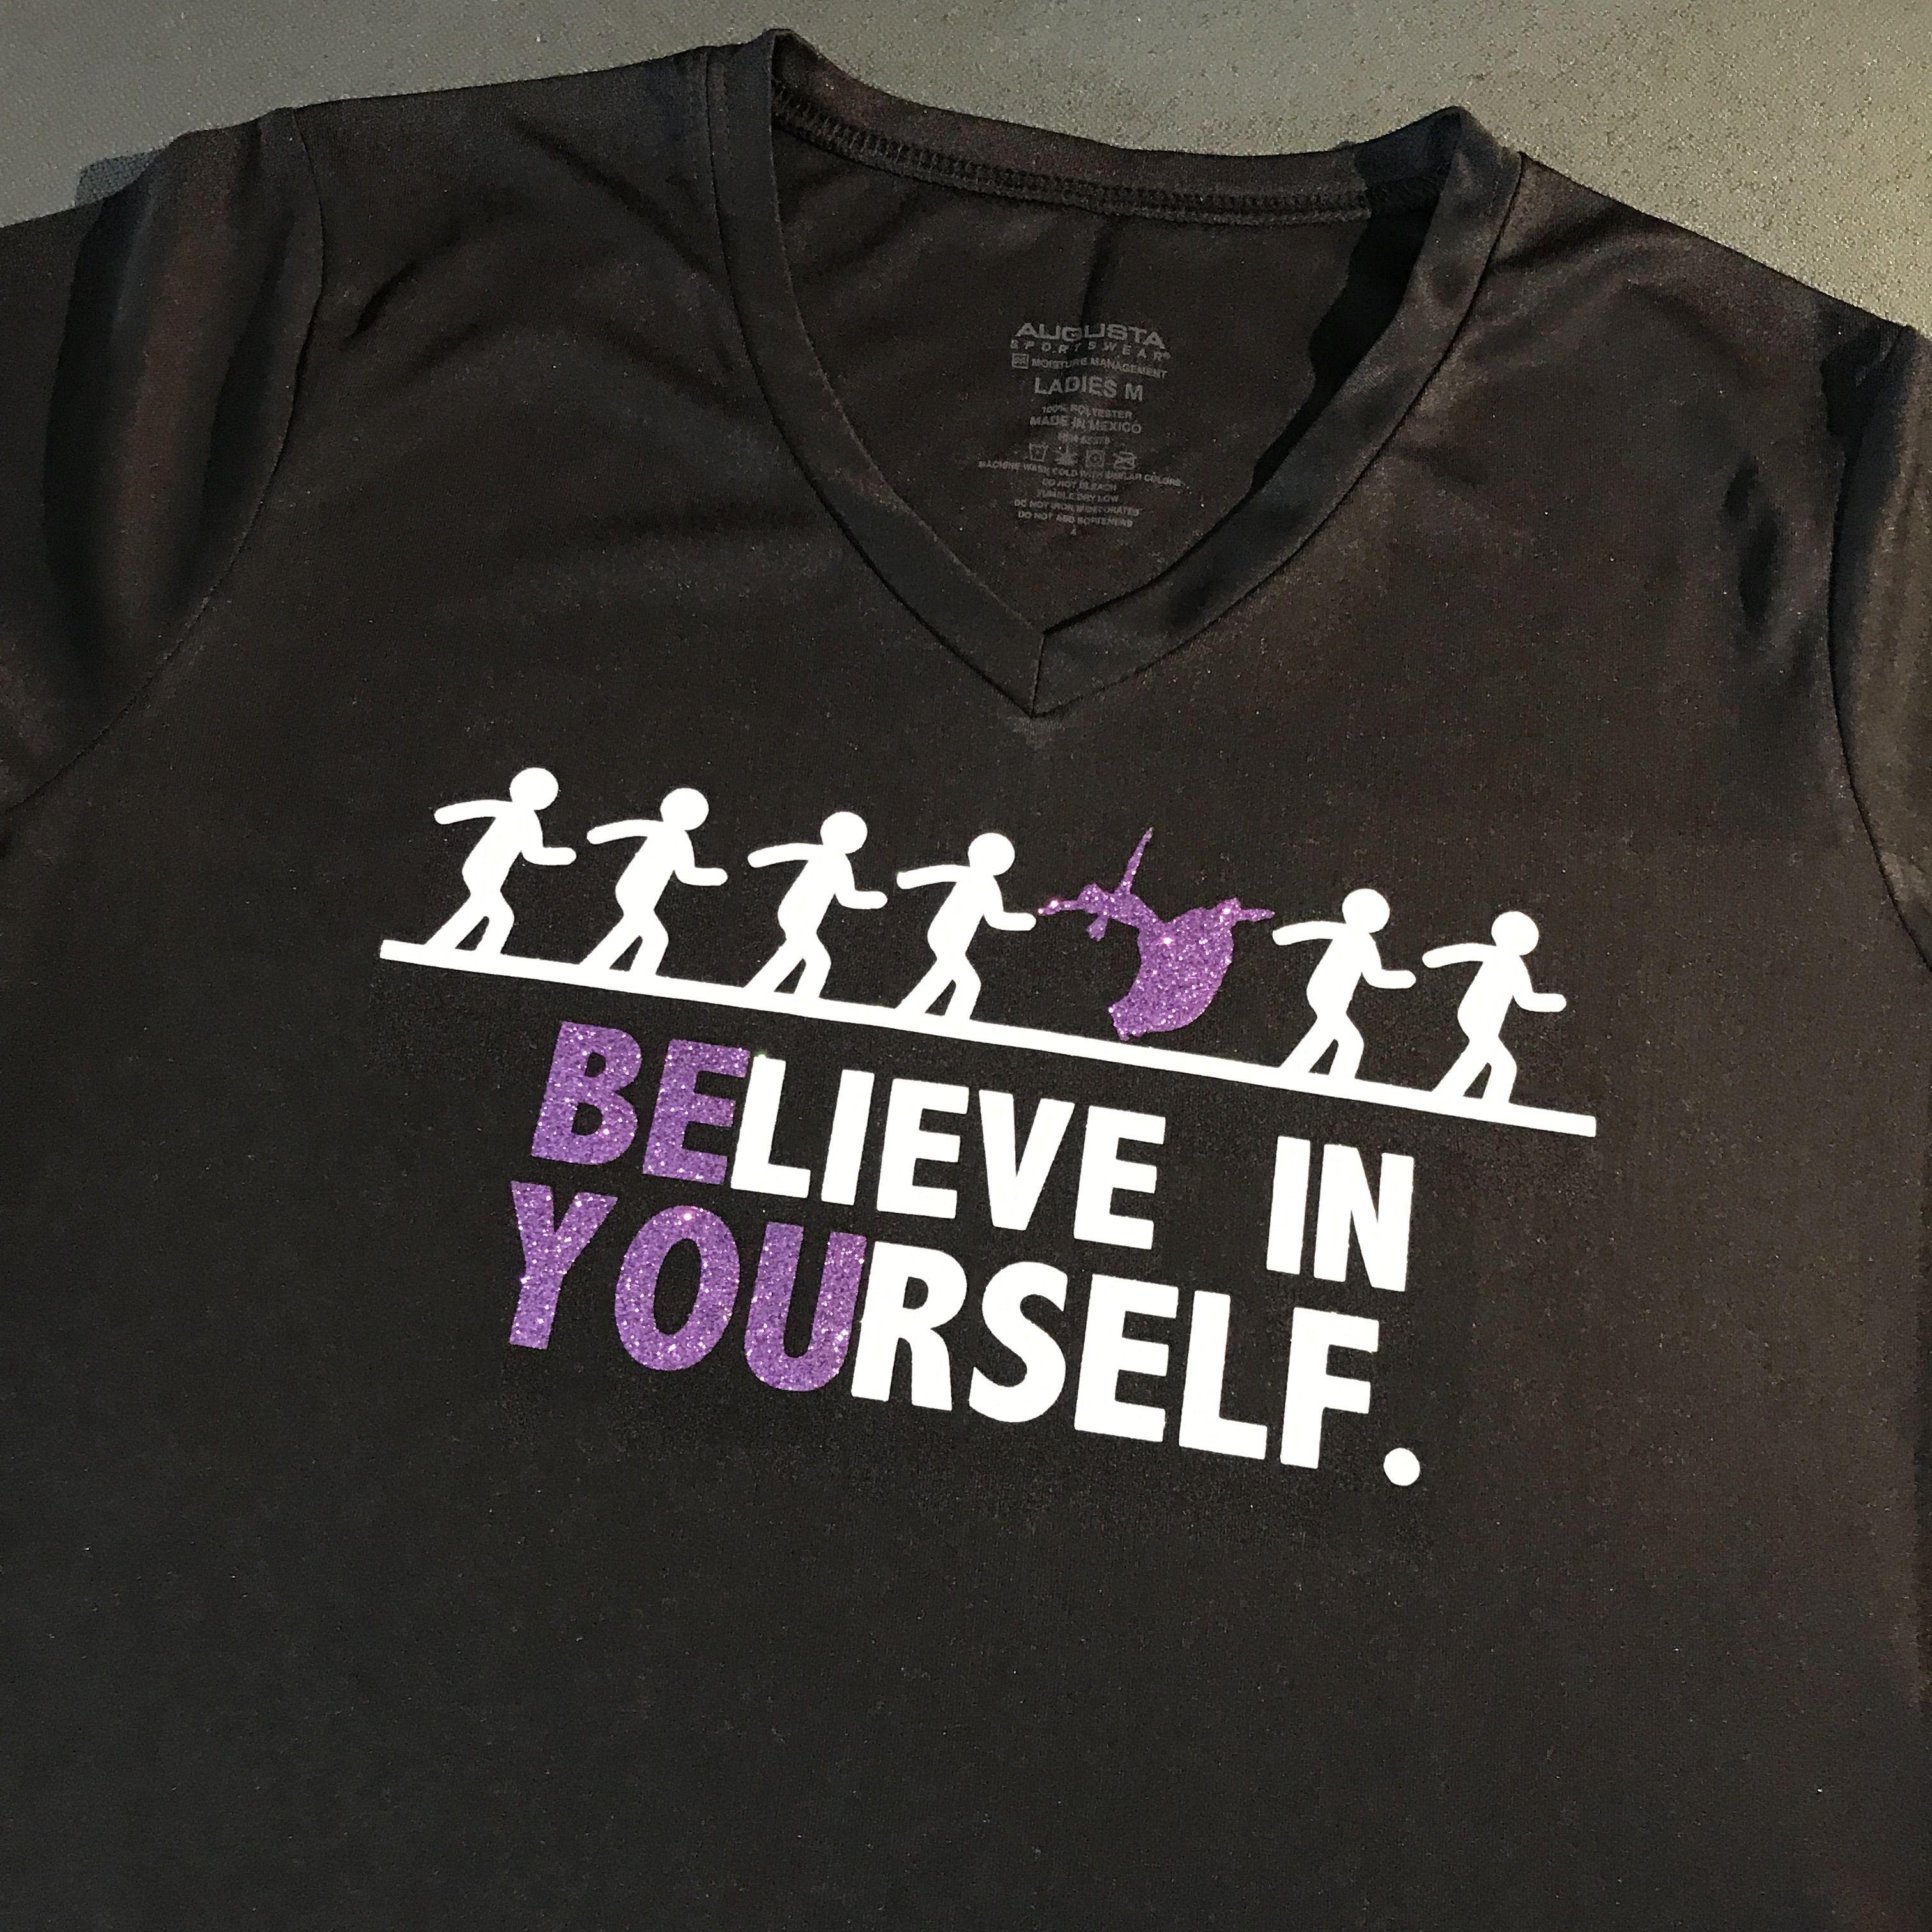 Believe In Yourself Tshirt Praise Dance Garments Dance Garments Praise Dance